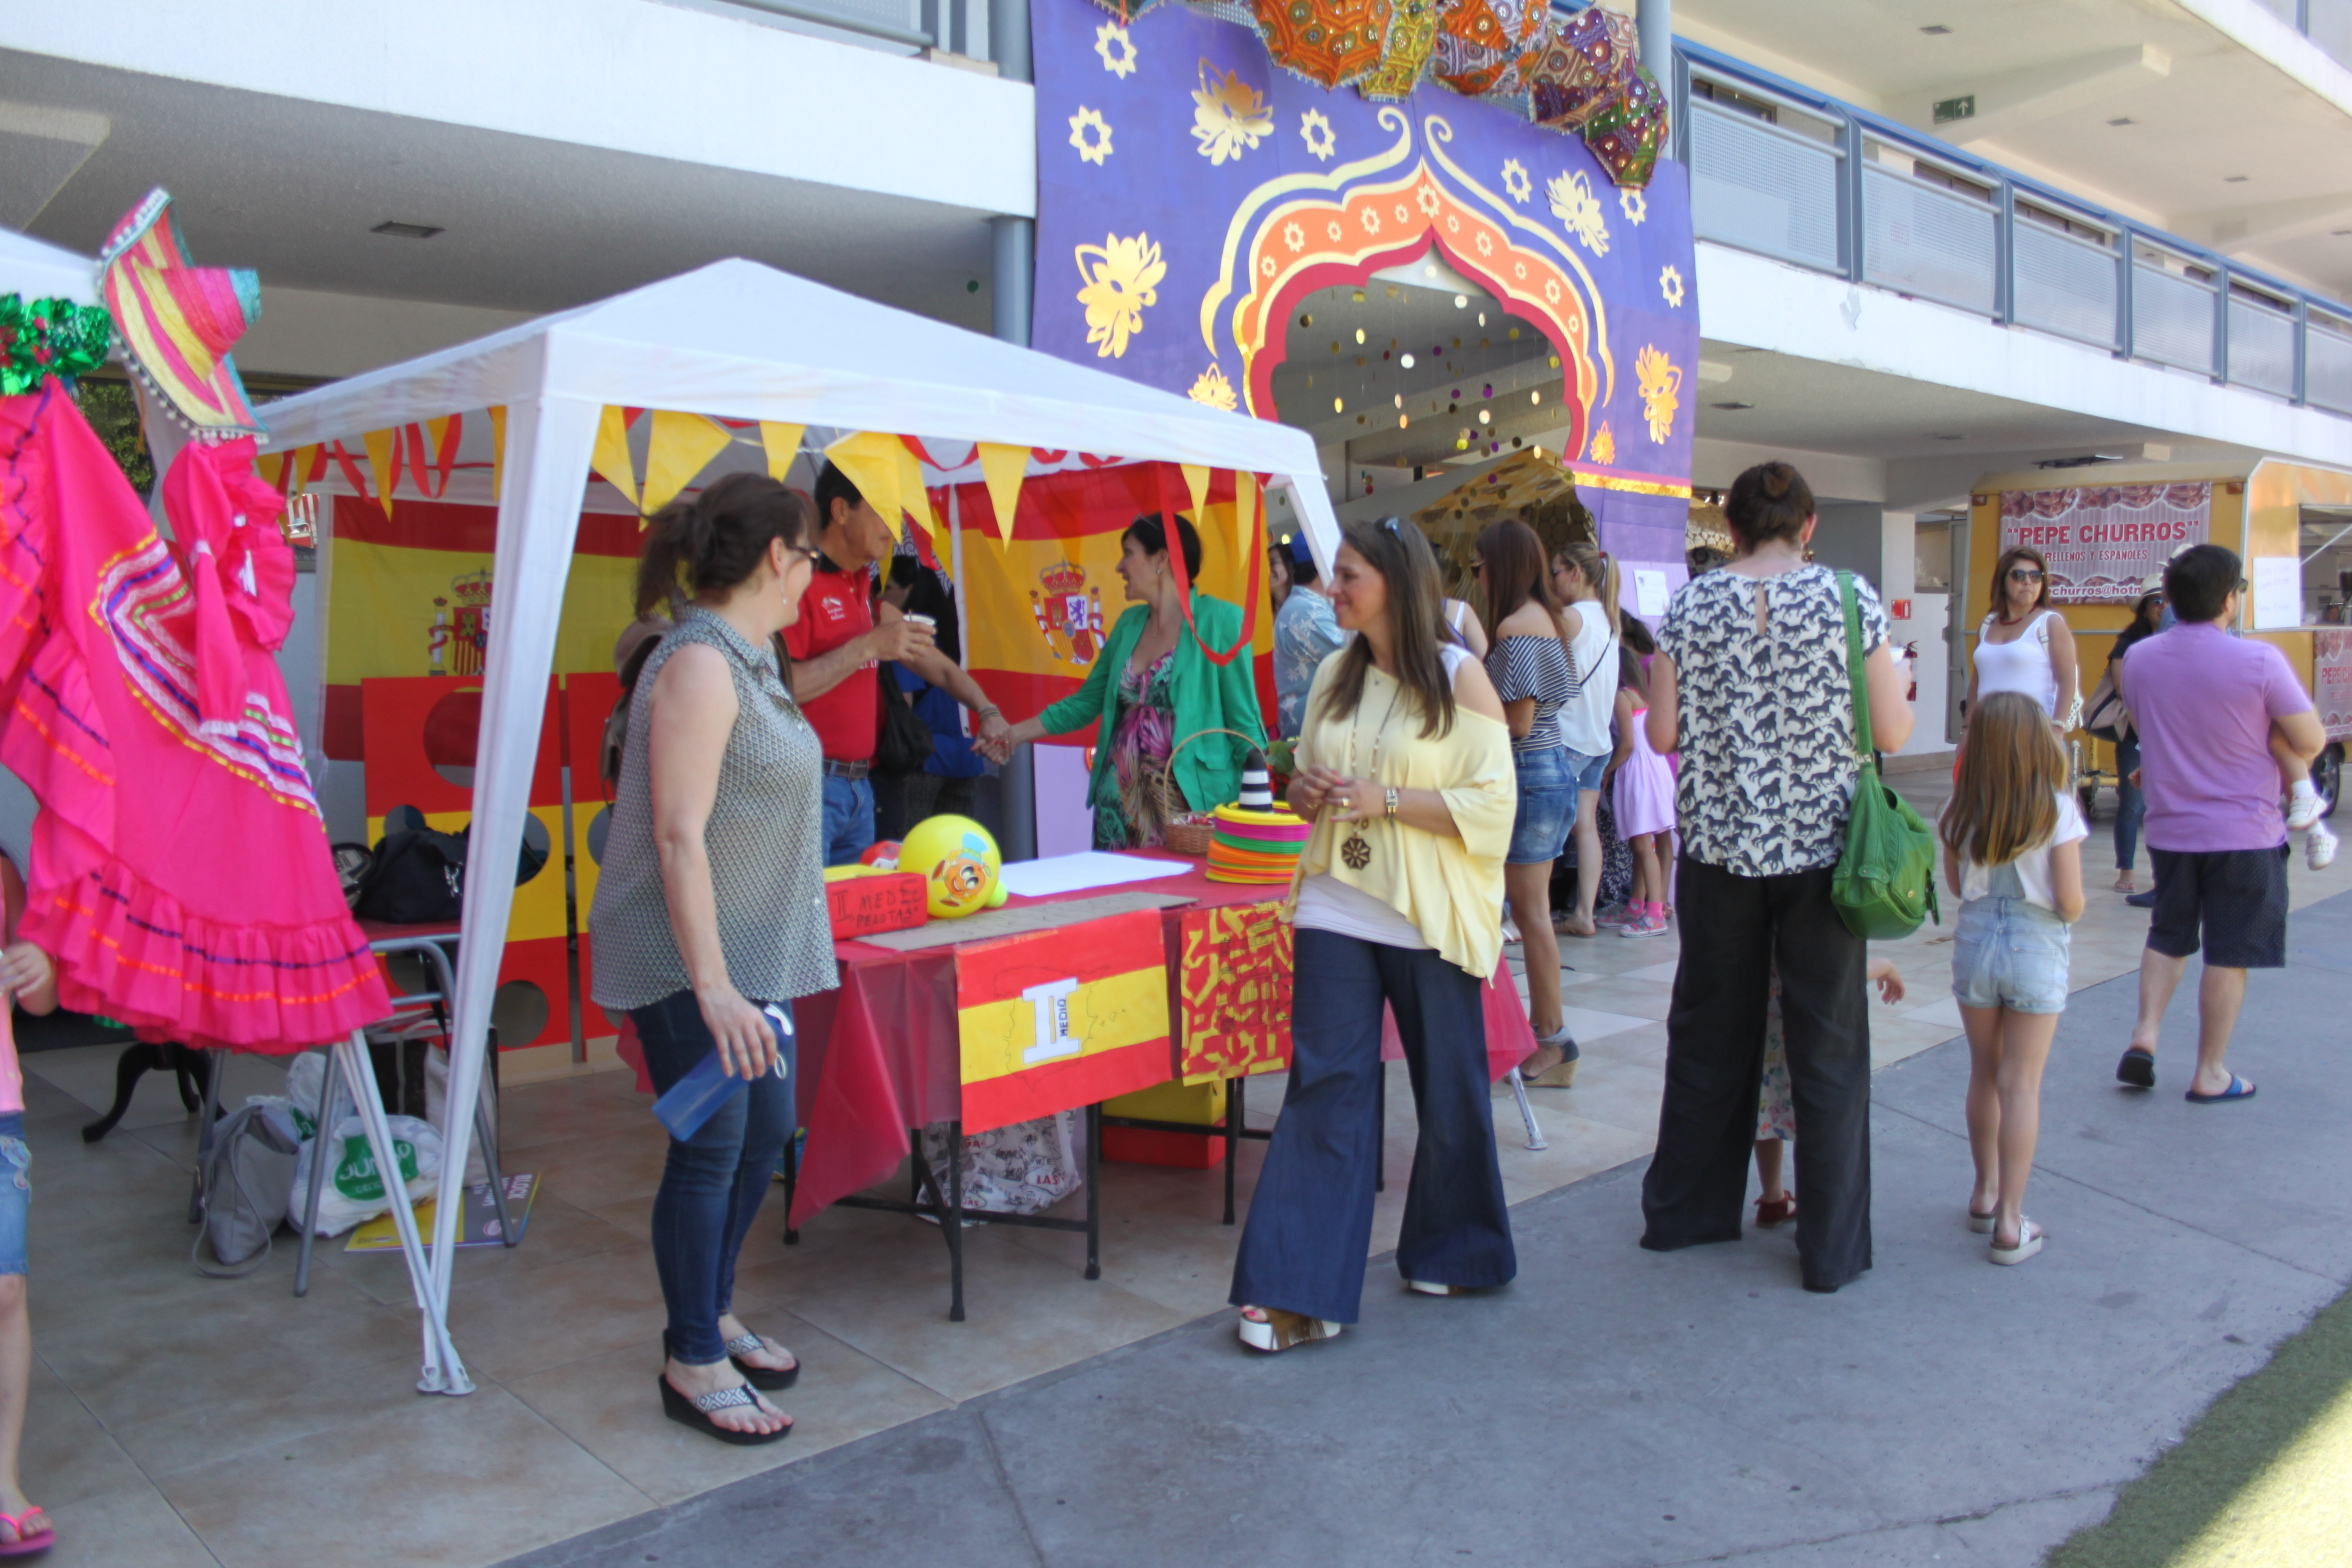 Kermesse: Stand España